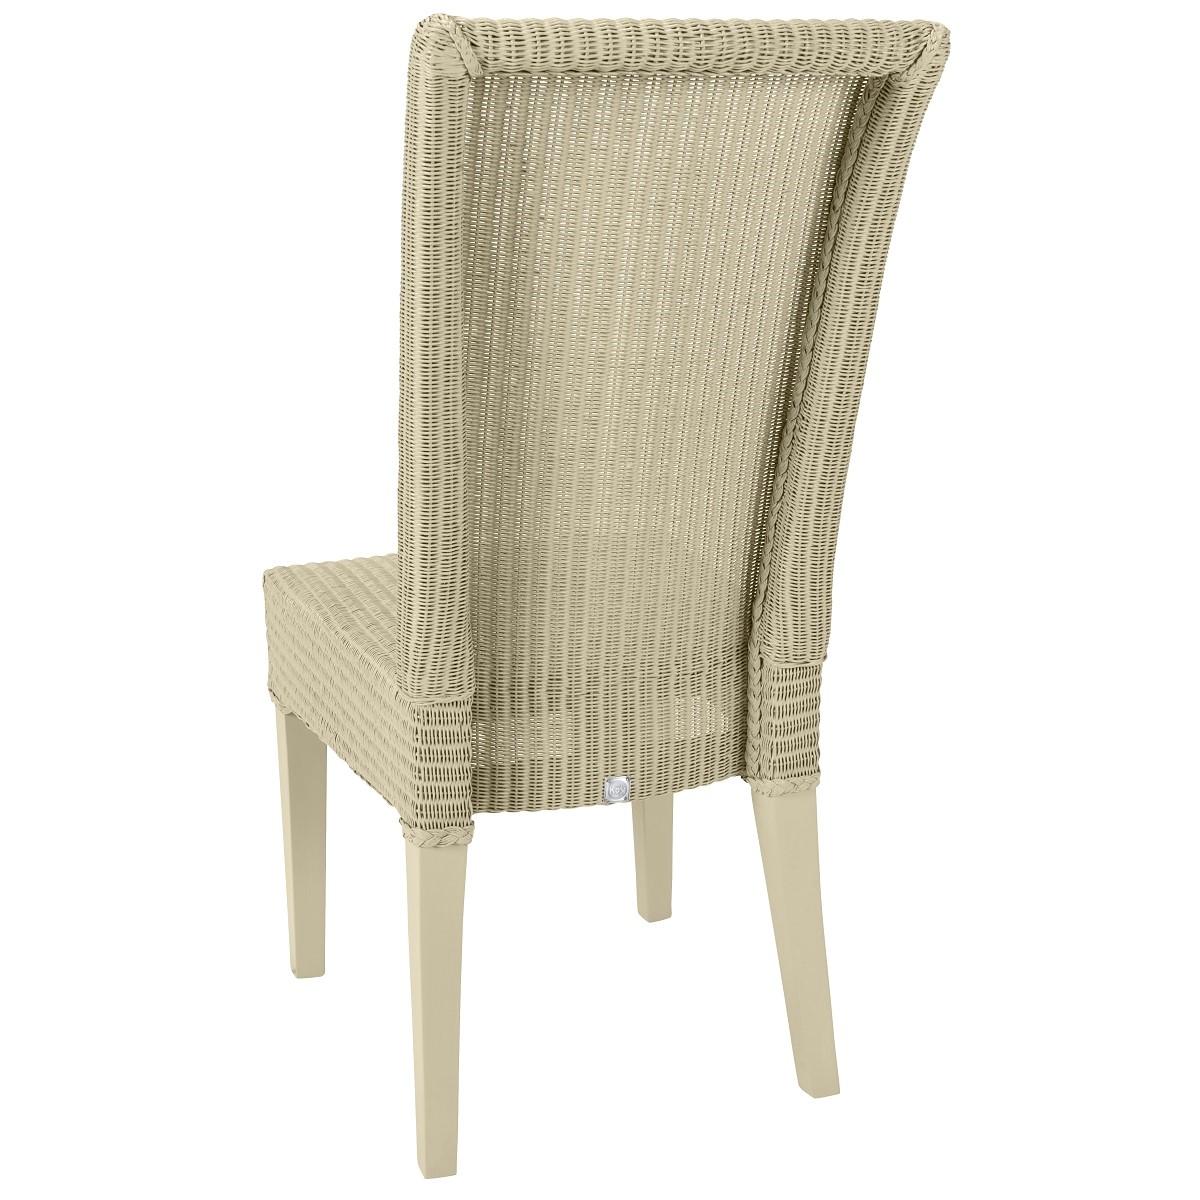 Chaise en Lloyd Loom laqué blanc cassé